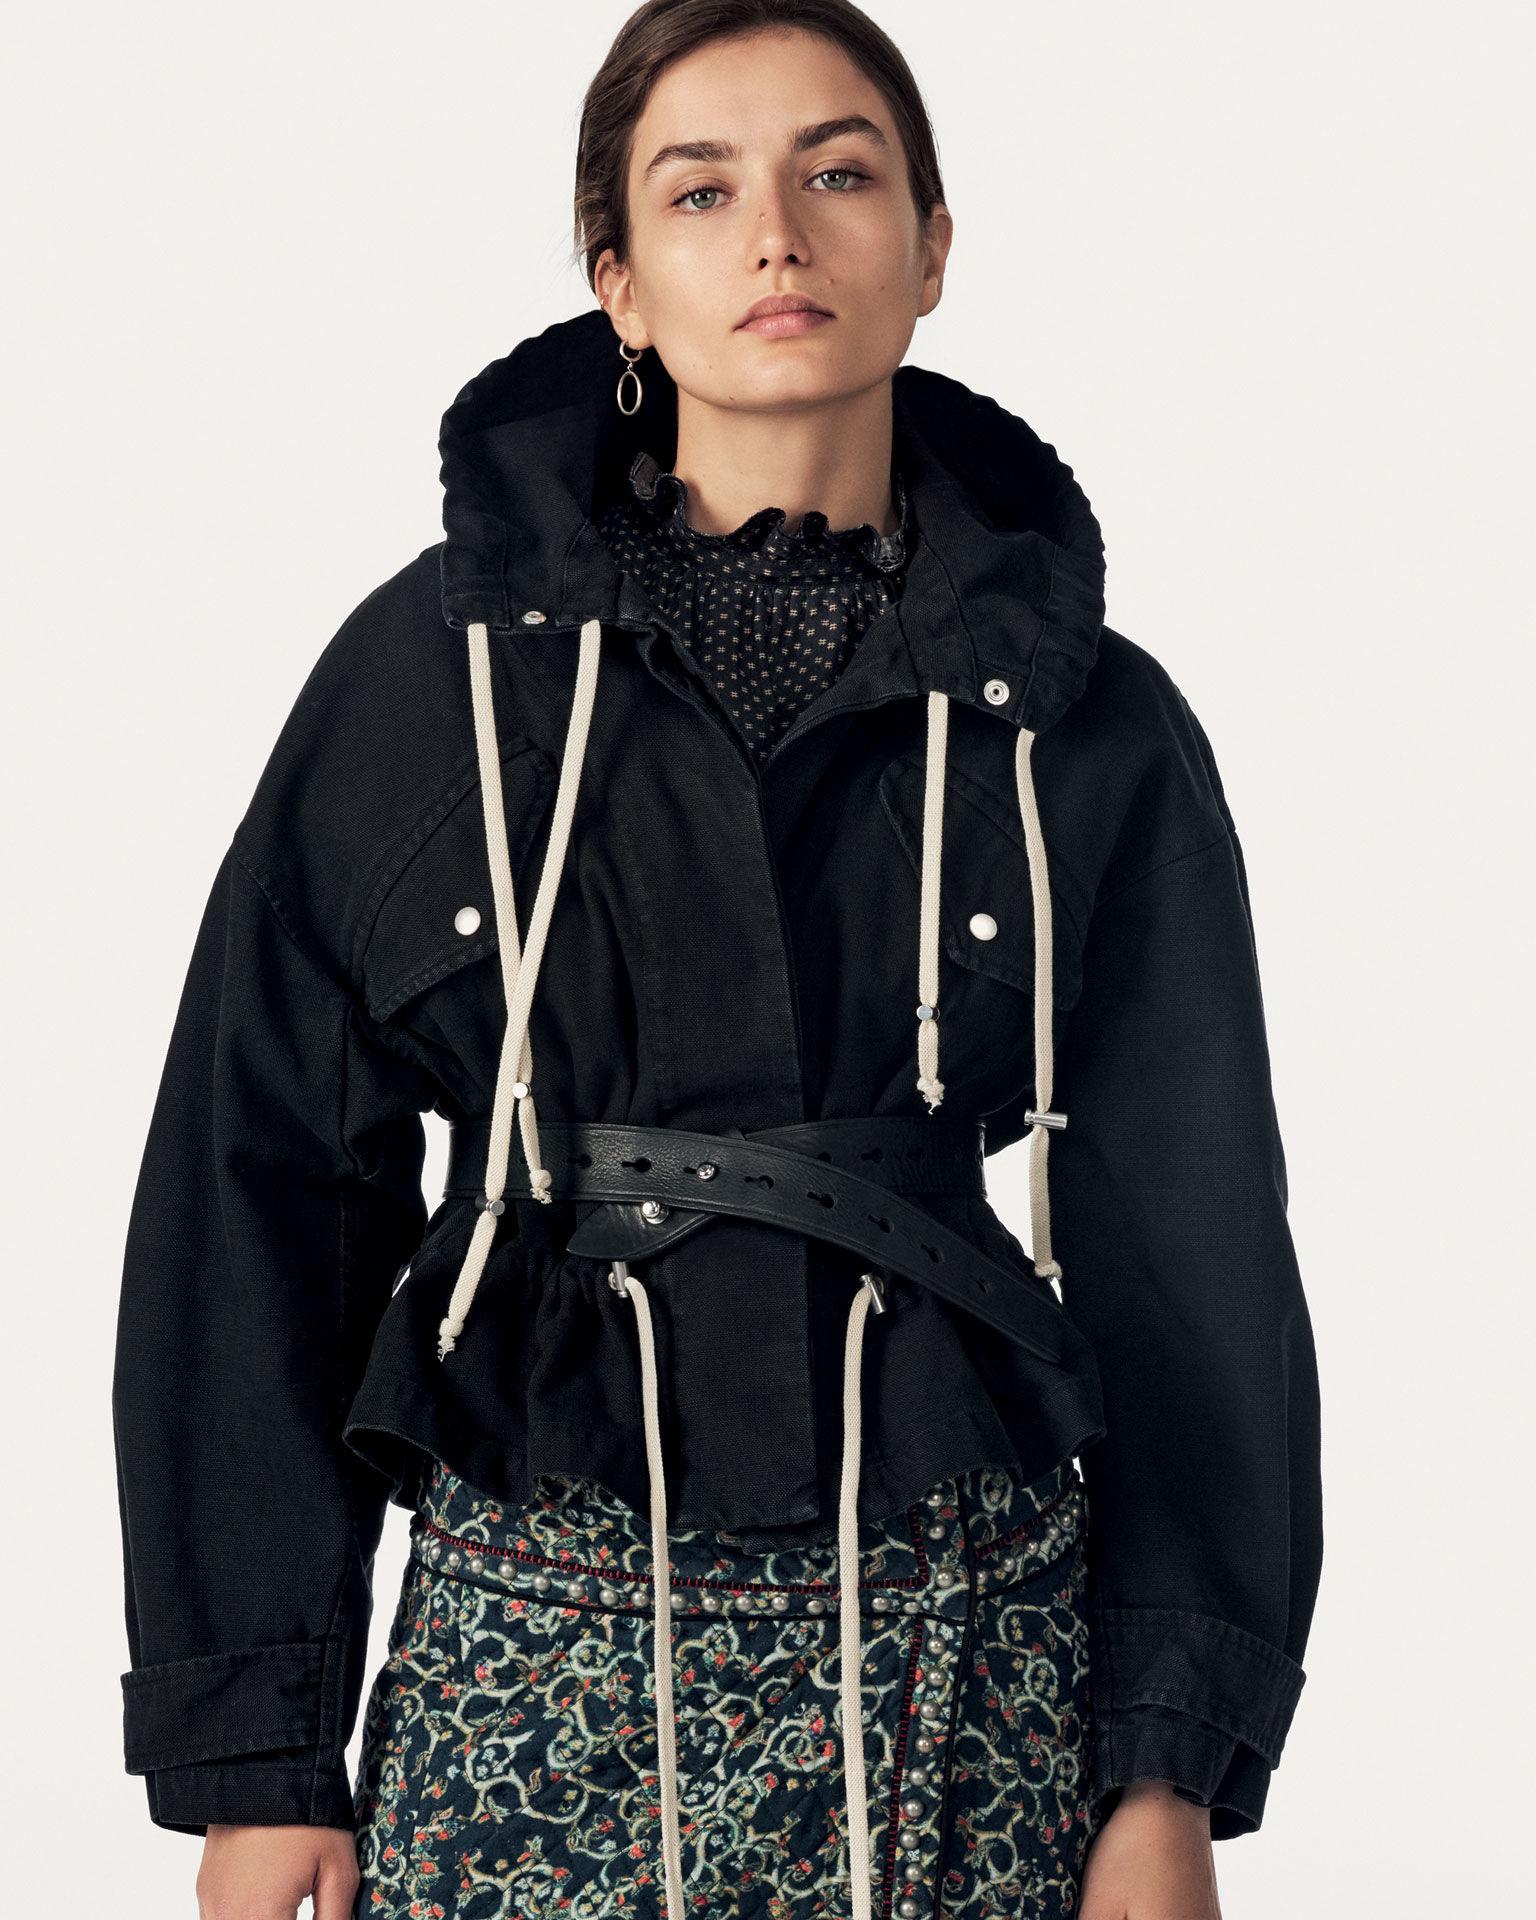 LAGILLY short jacket